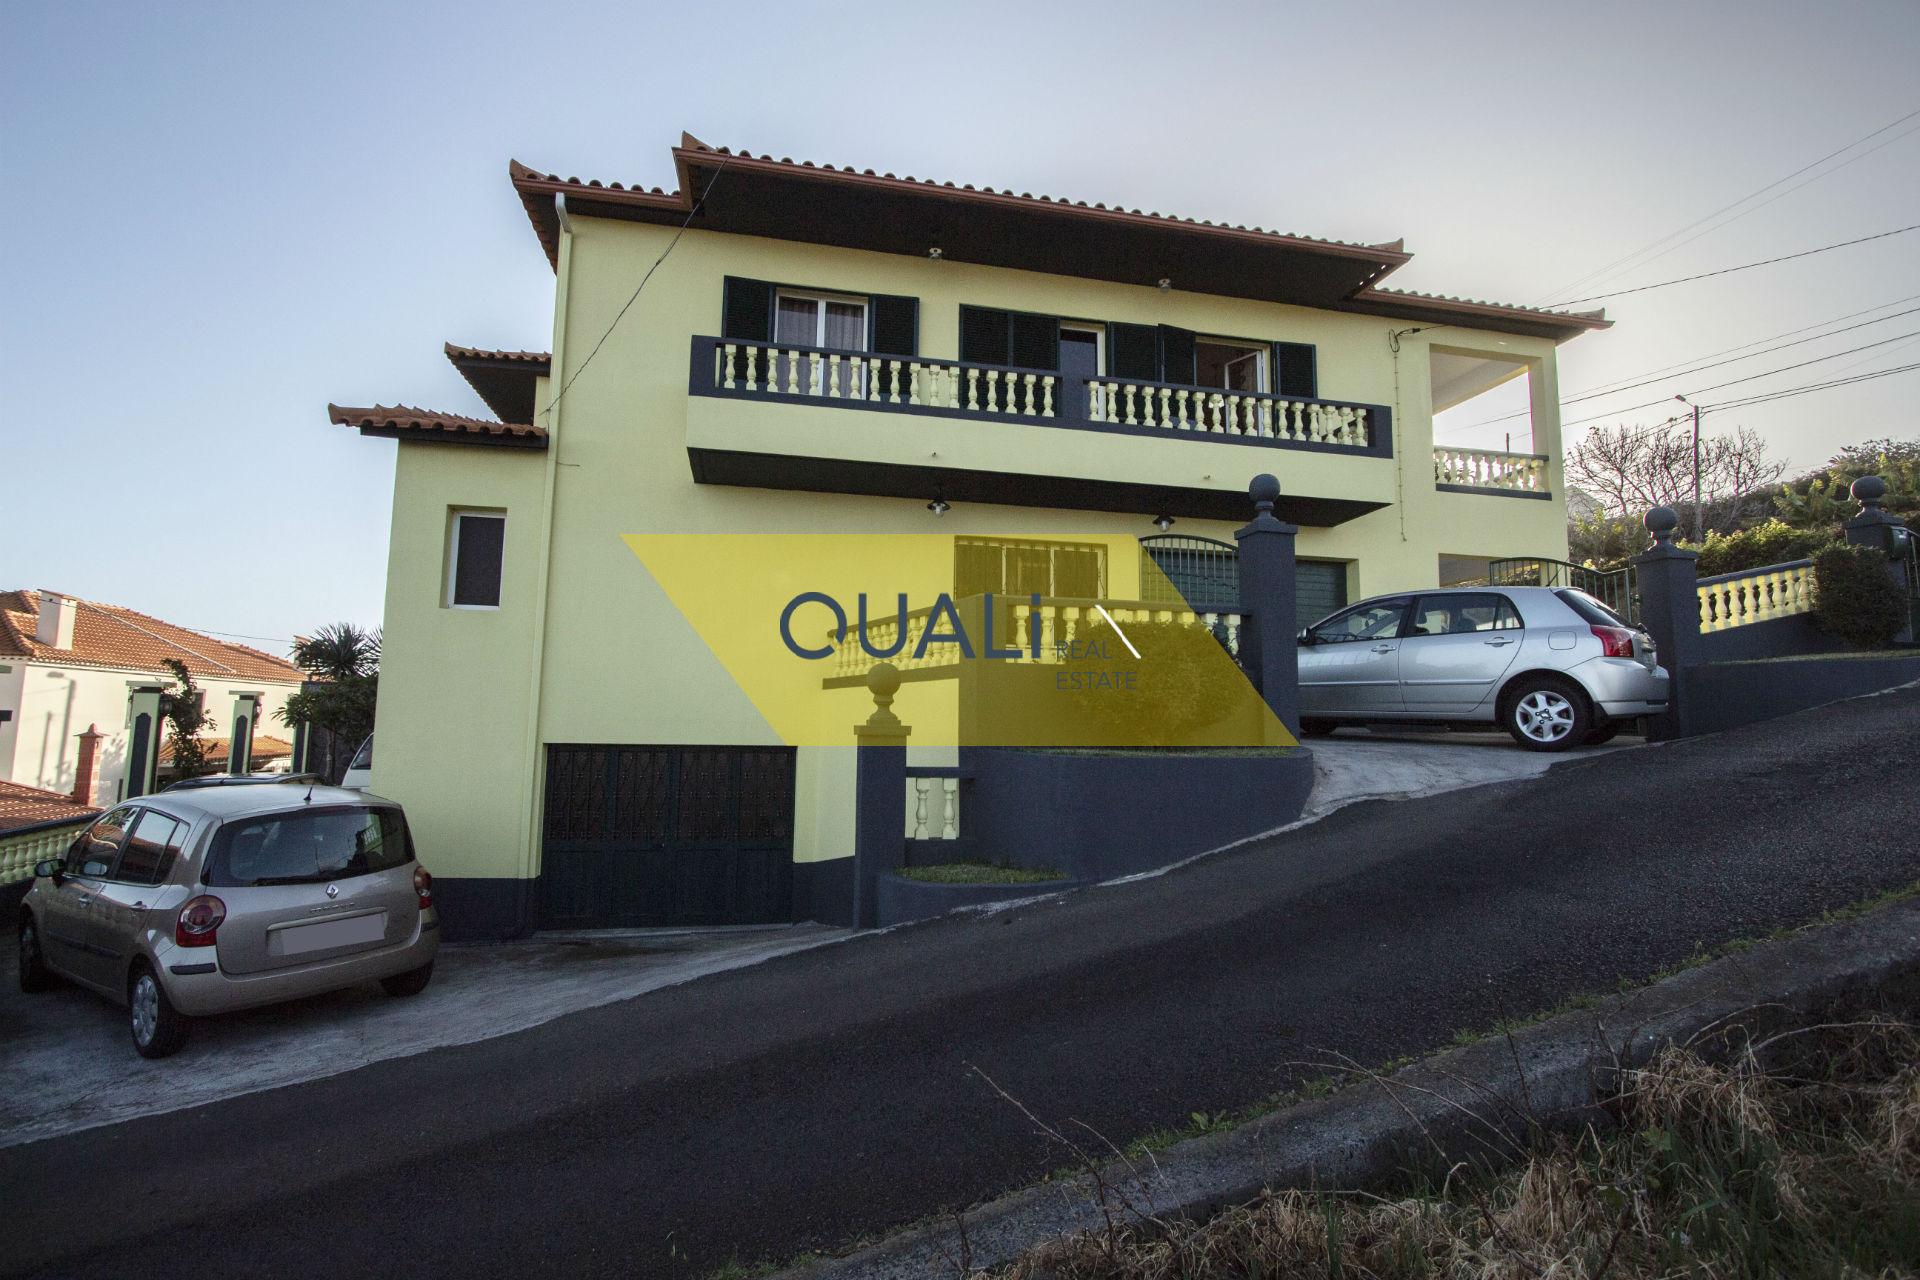 Moradia isolada localizada em Gaula,€265.000,00